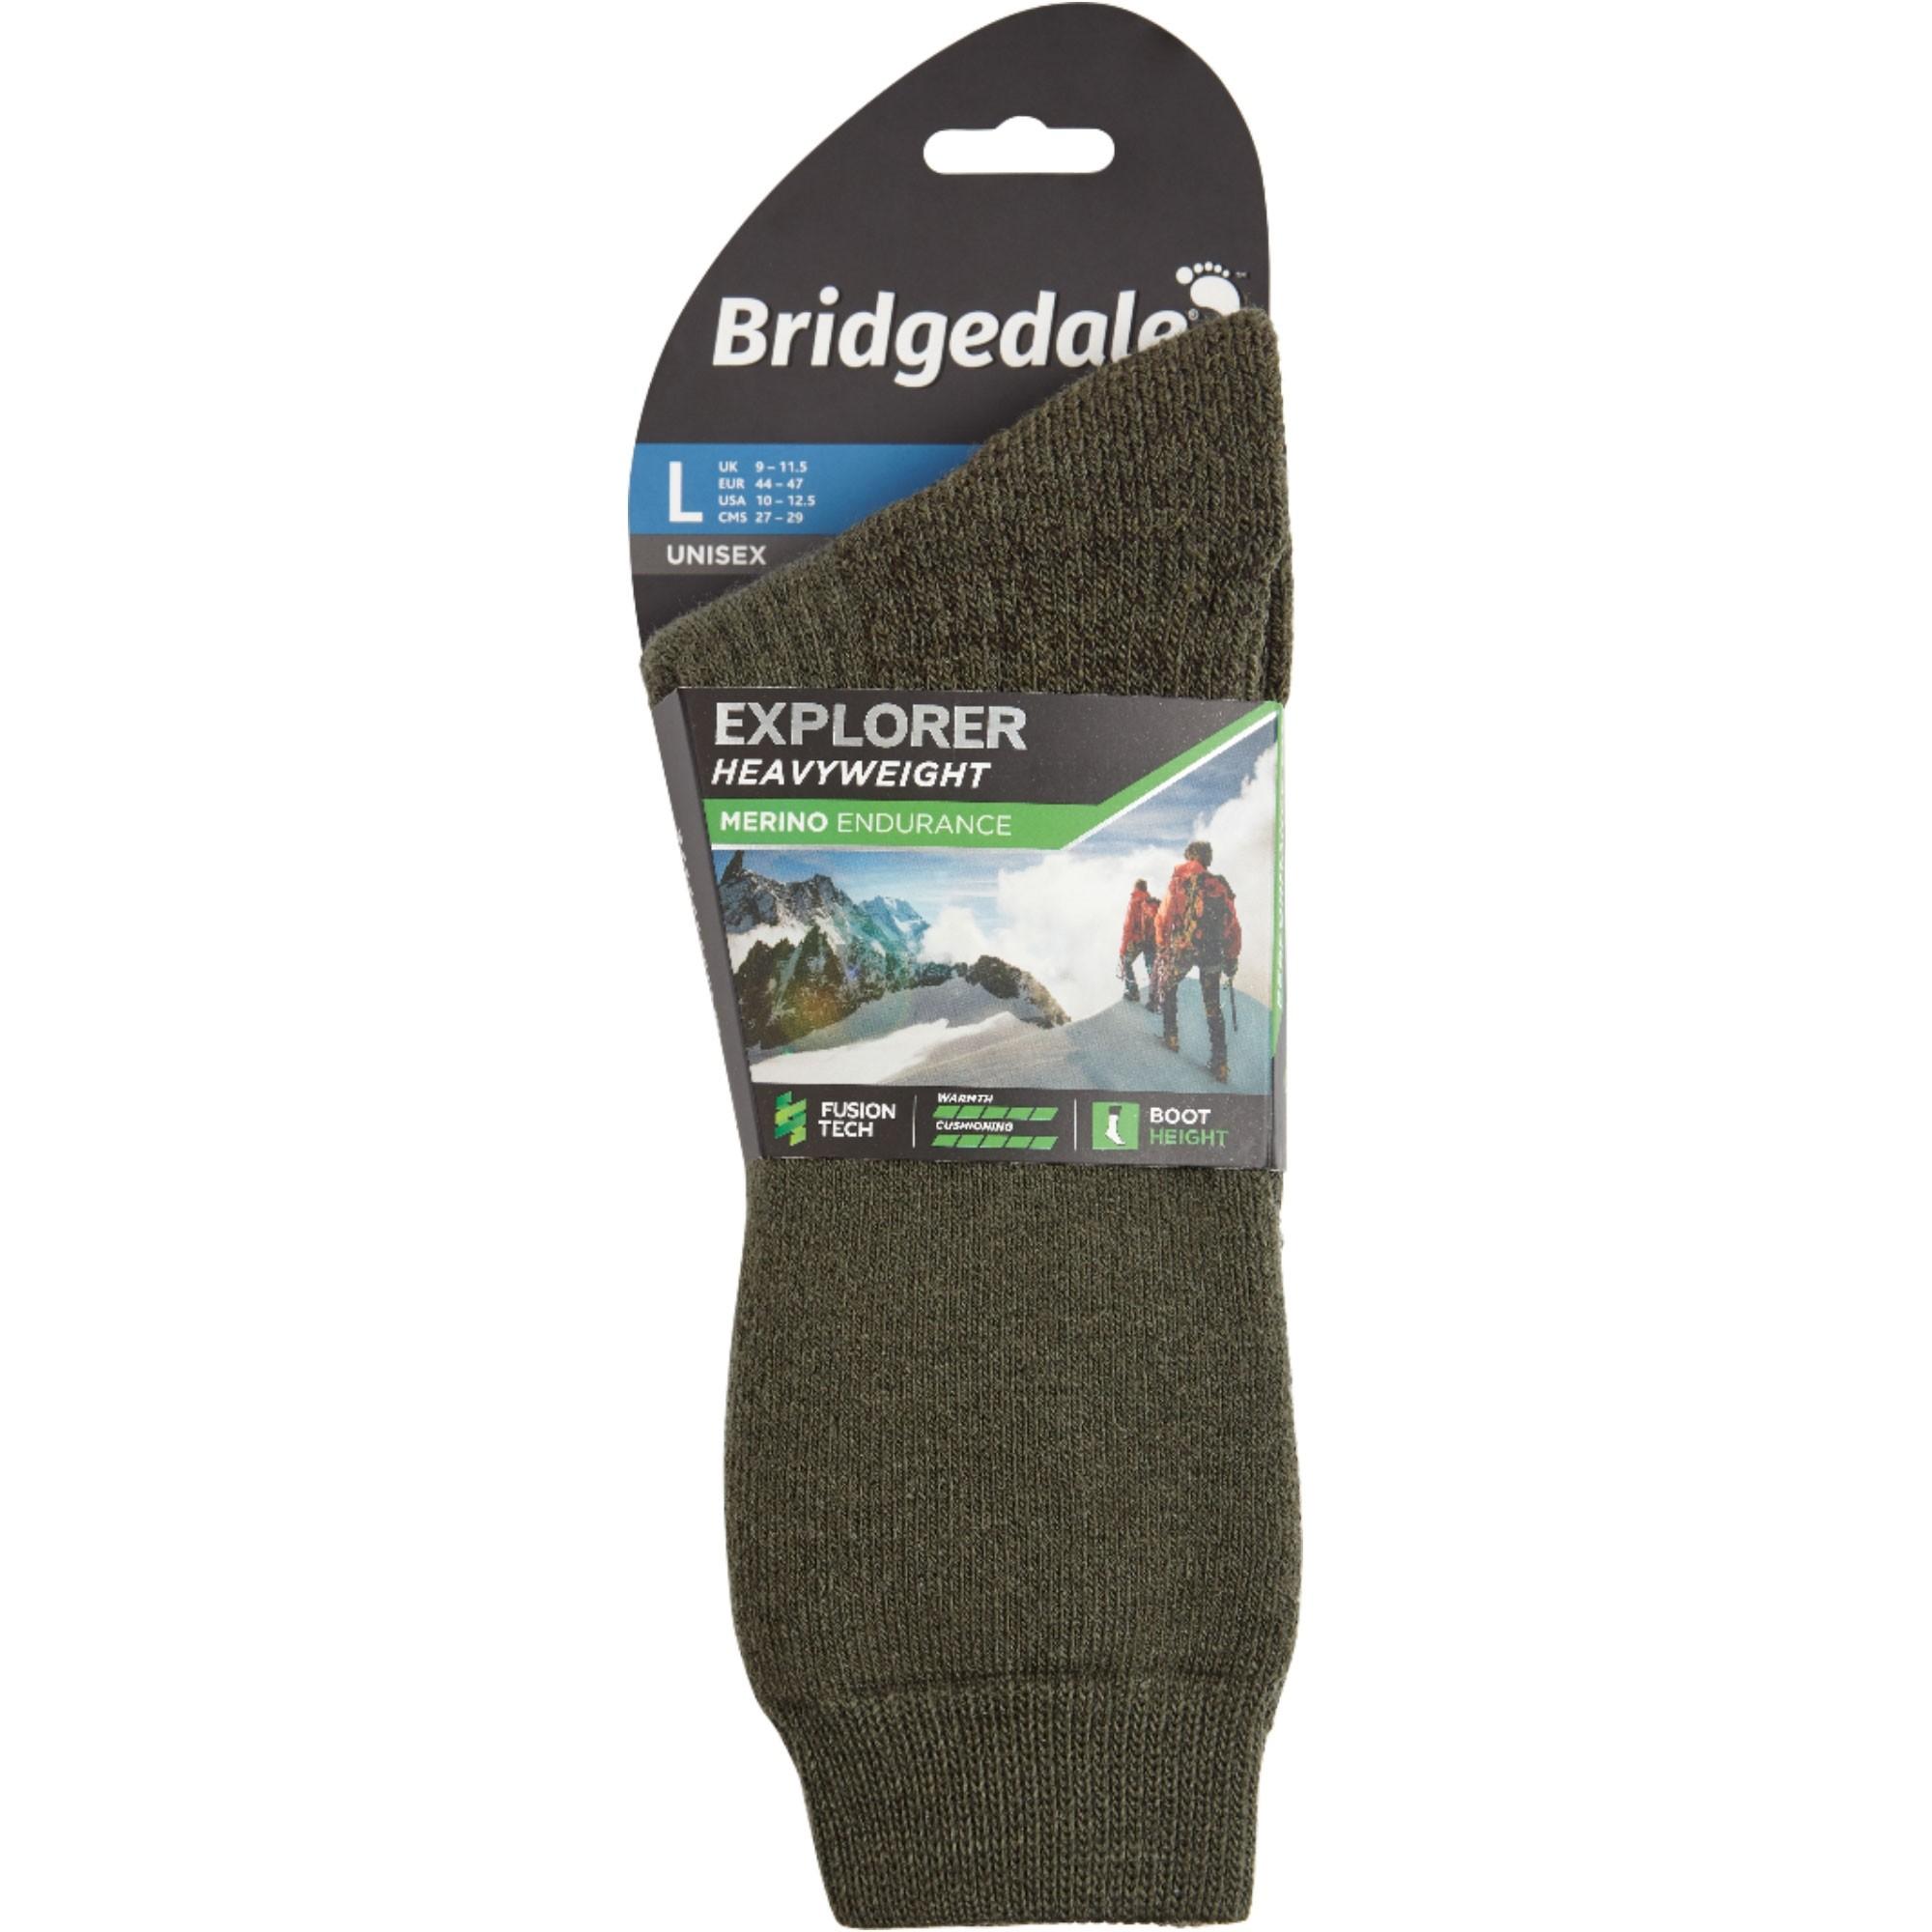 Bridgedale Explorer Heavyweight Merino Performance Socks - Olive